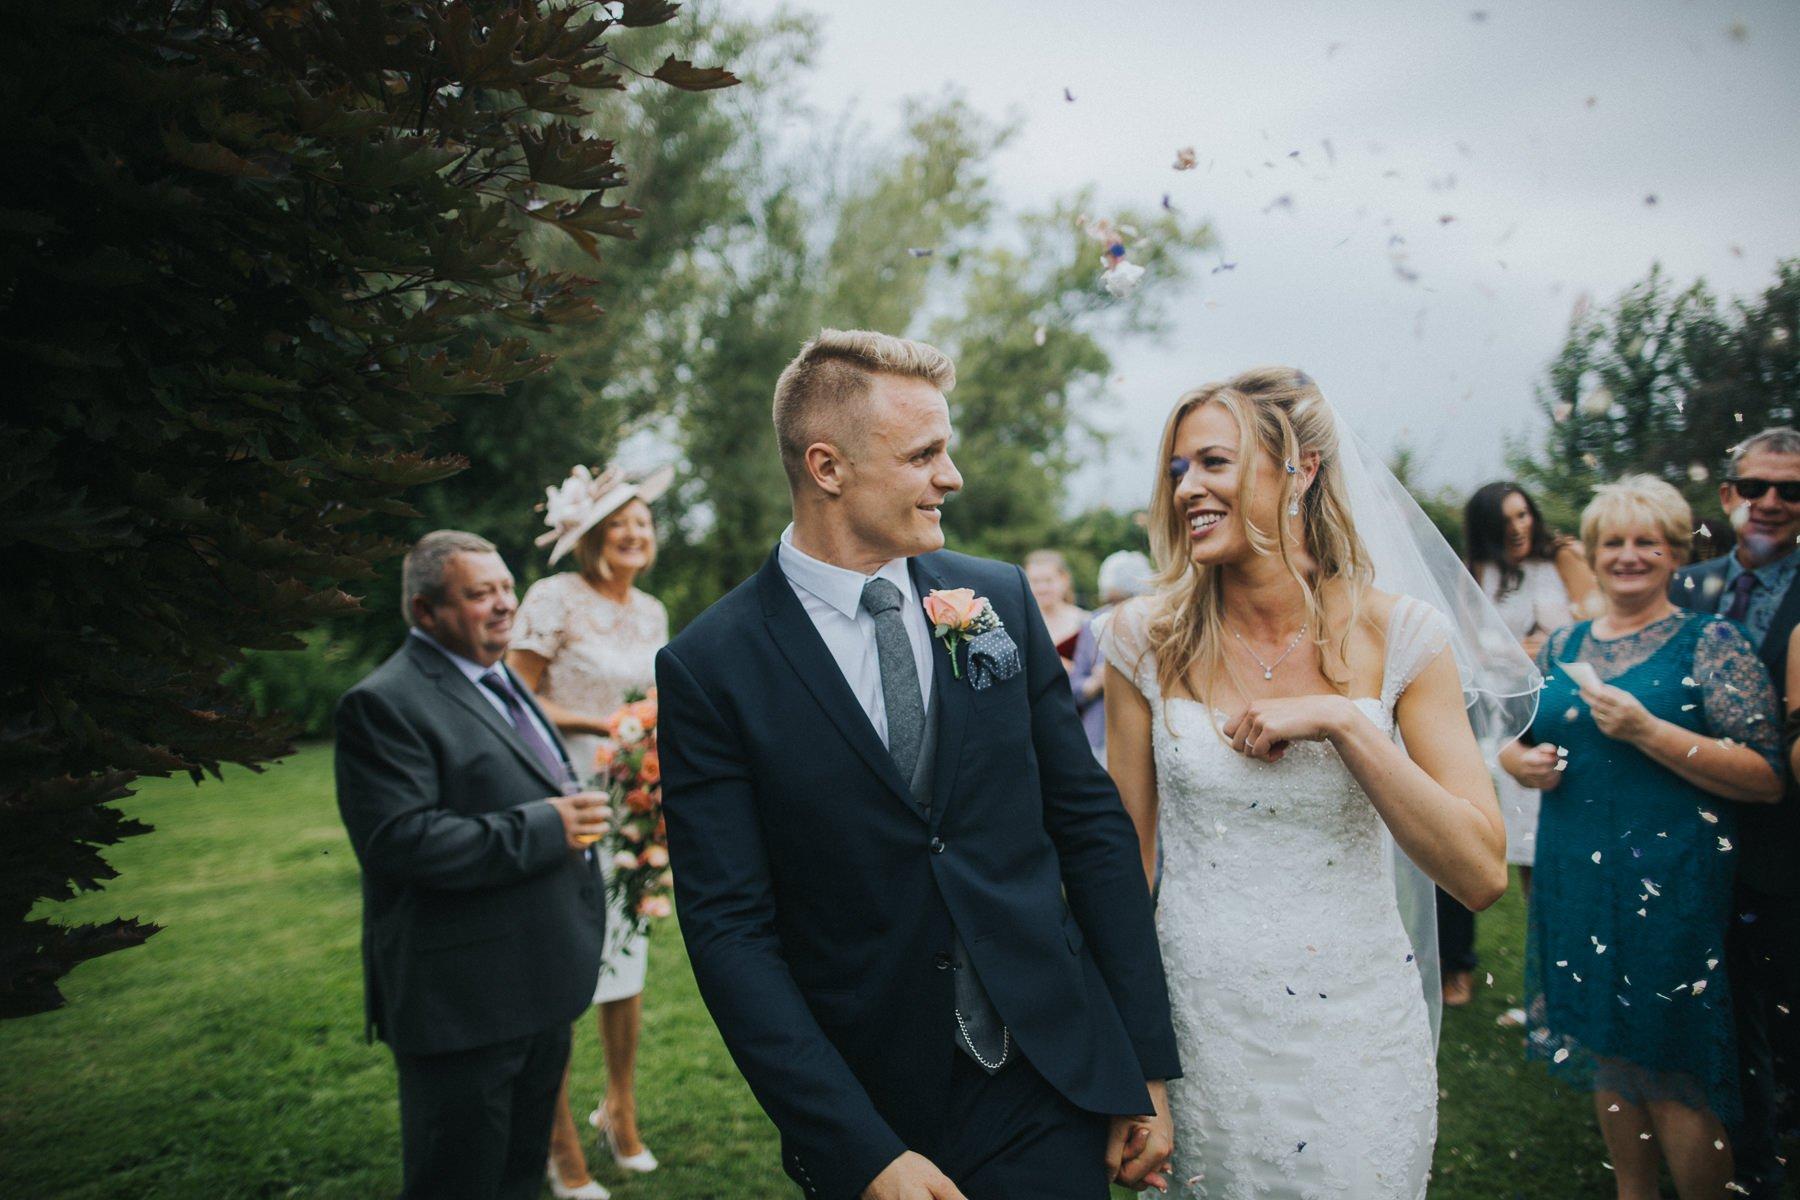 rumbolds-barn-wedding-photography-fazackarley-jess-chris-069